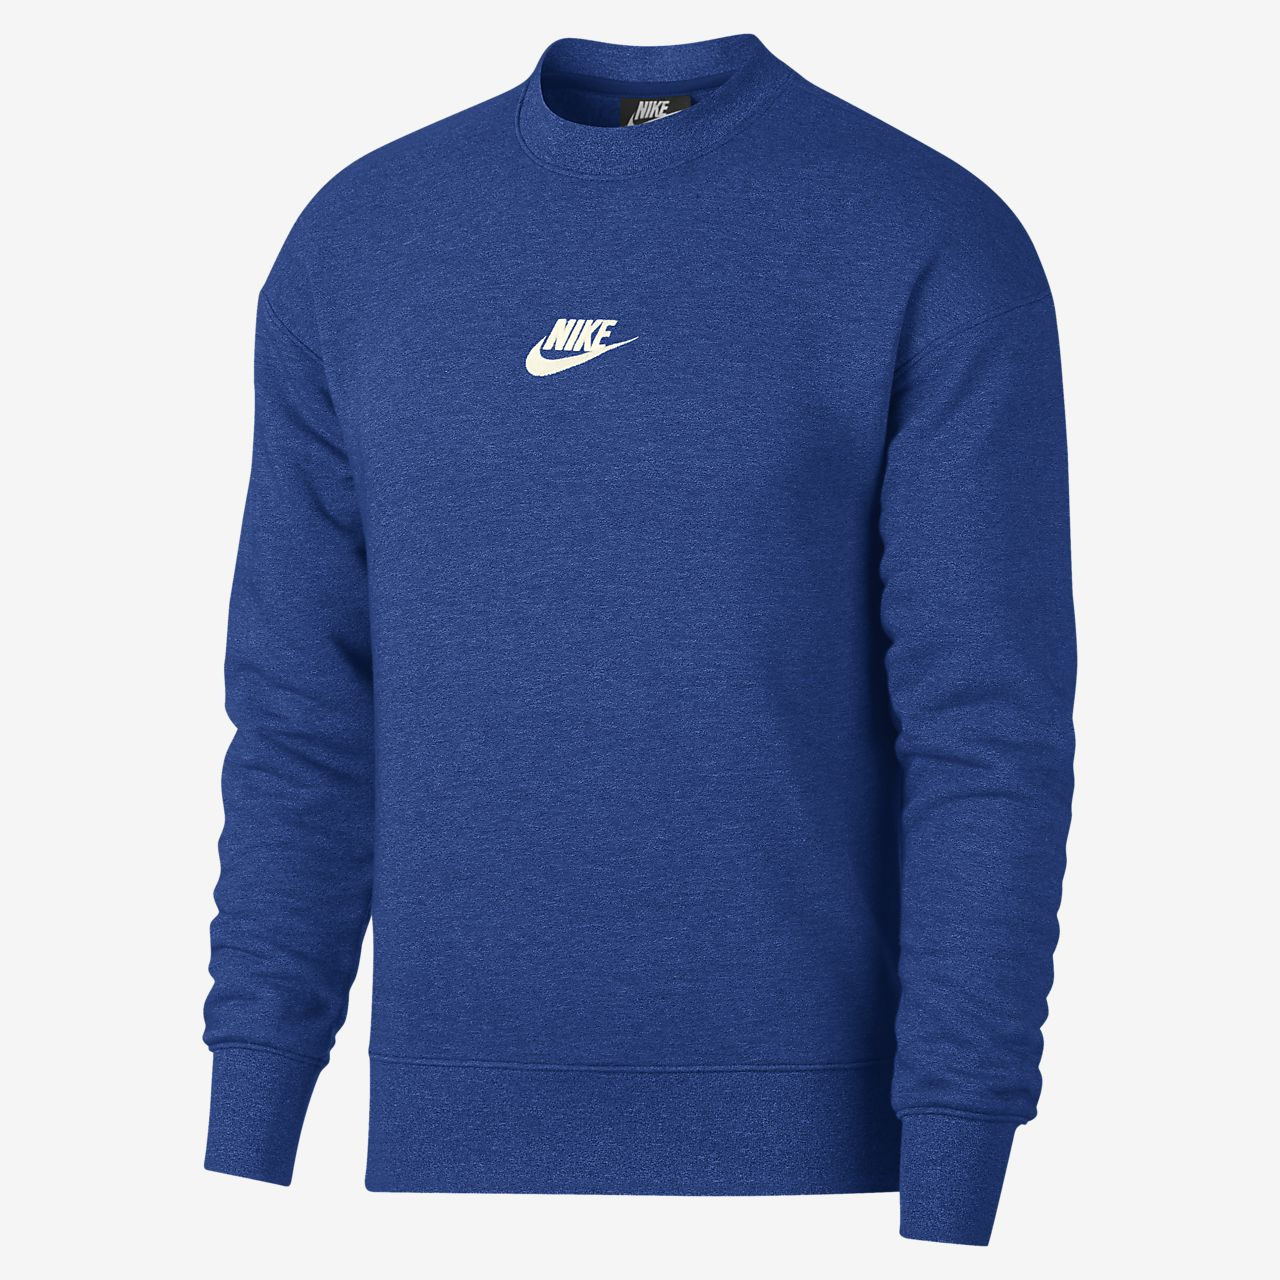 Nike Sportswear Heritage Men's Fleece Crew